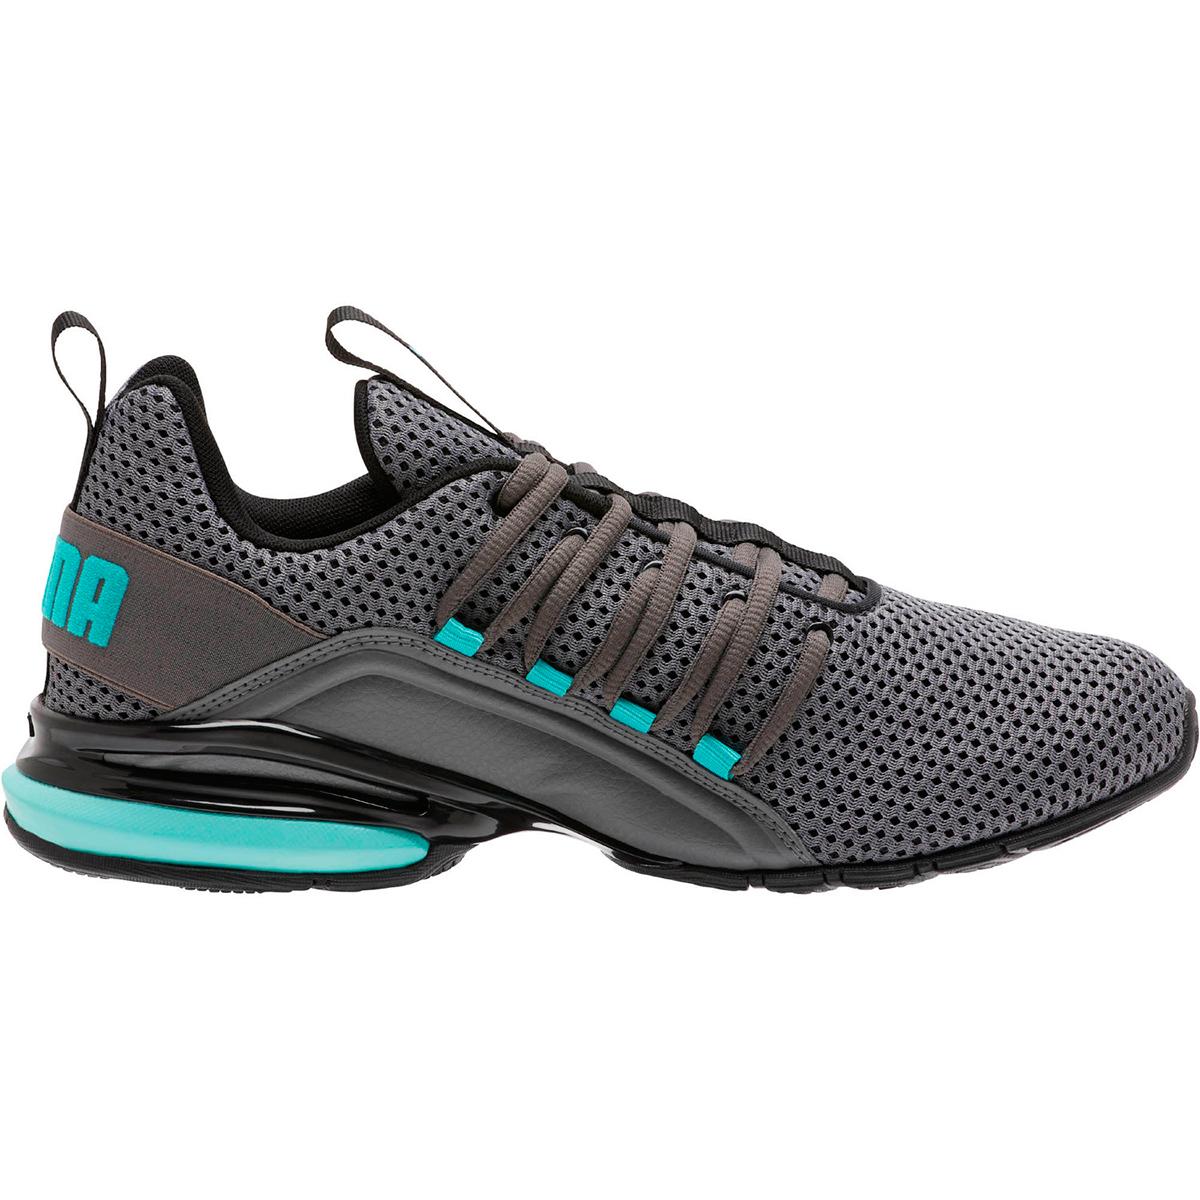 Puma Men's Axelion Breathe Training Shoes - Black, 10